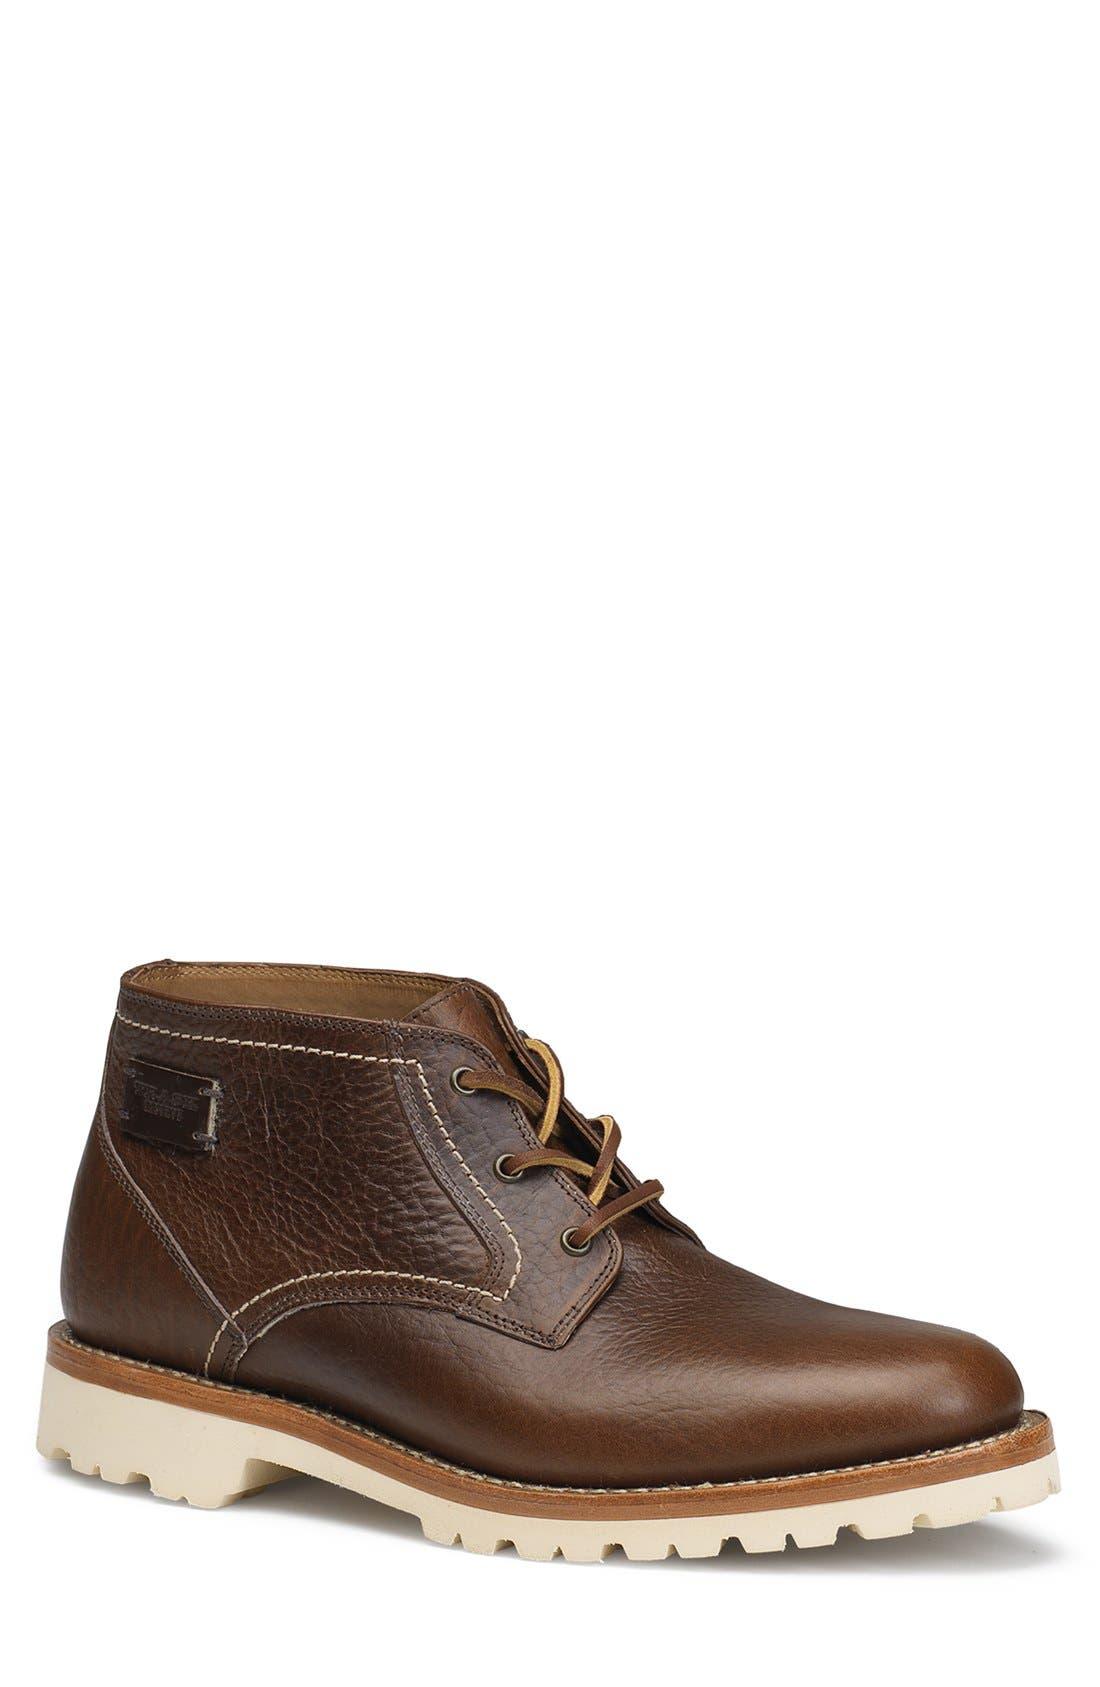 Alternate Image 1 Selected - Trask 'Bighorn' Plain Toe Boot (Men)